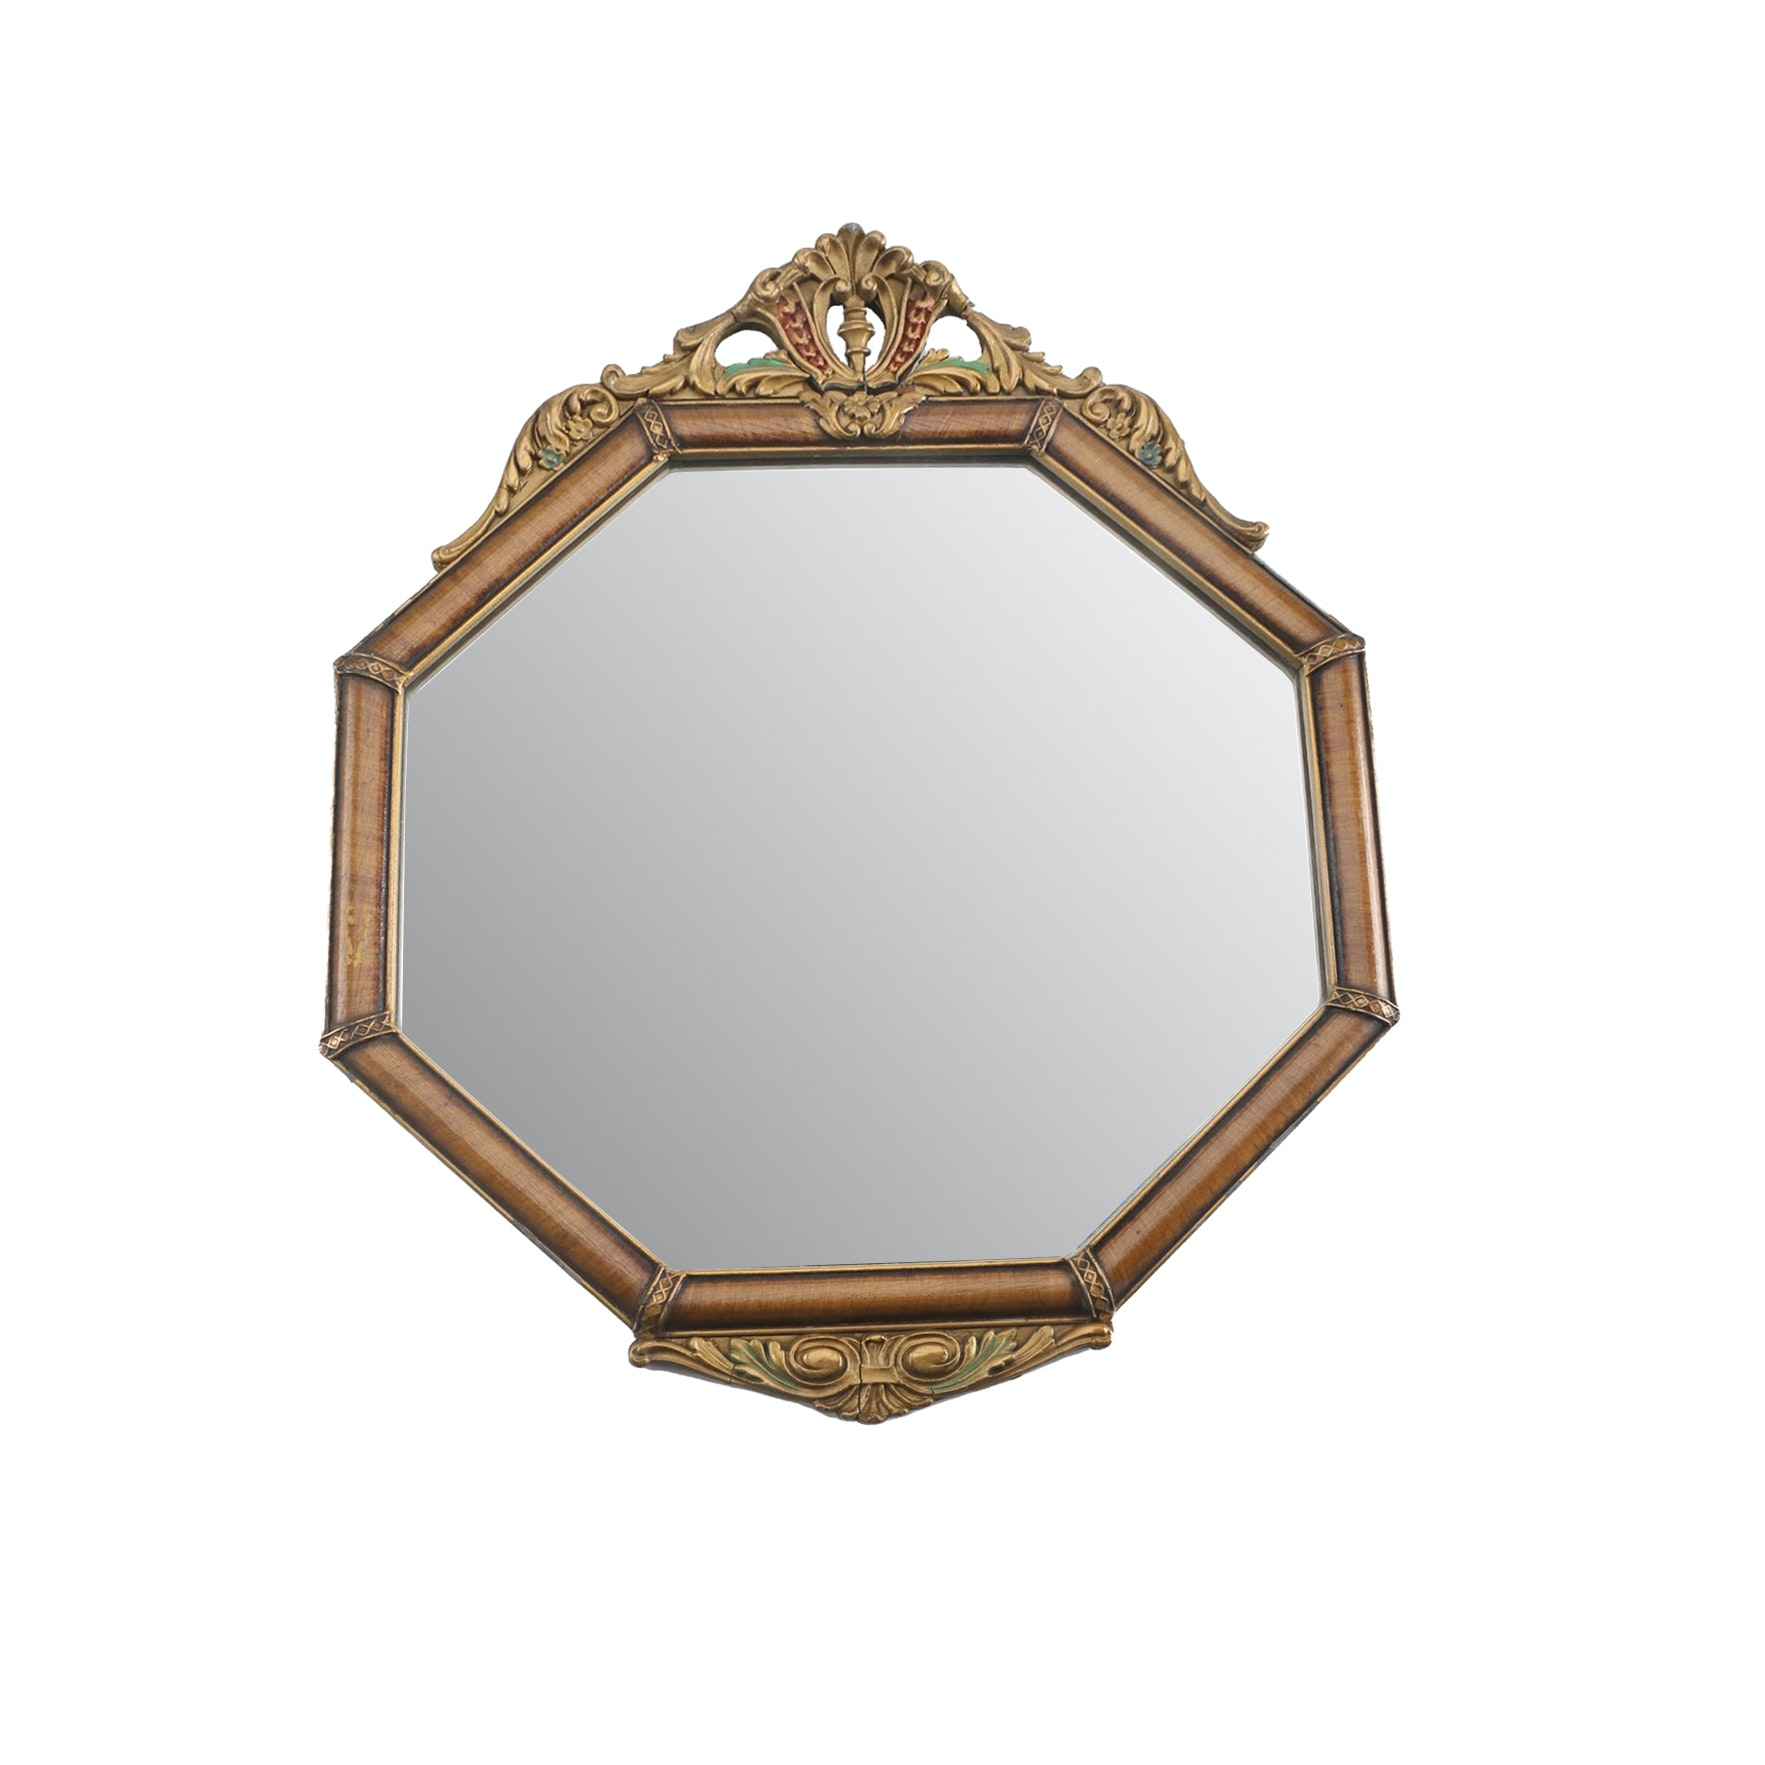 Octagonal Shaped Wood Framed Wall Mirror